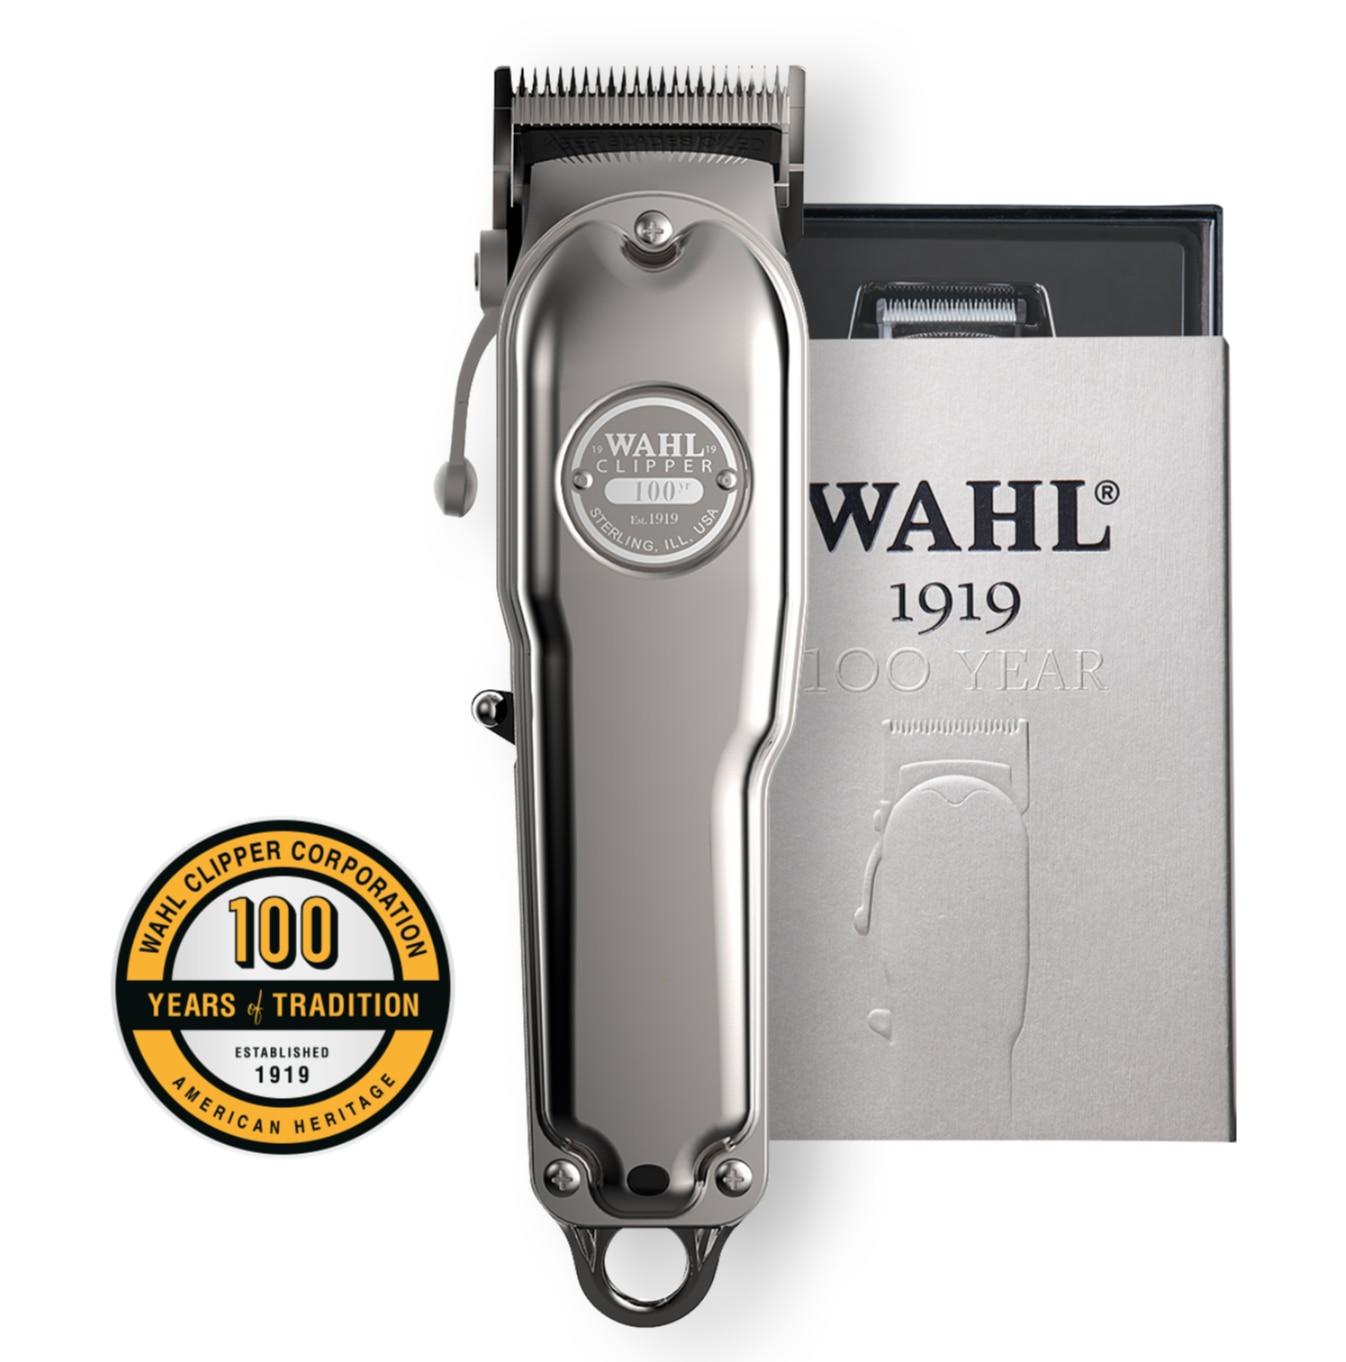 Wahl 1919 Pro 100 Year Anniversary Limited Edition Cordles Hair Clipper Trimmer, Hair Cut Kit, Hair Cutting Machine, Shaver